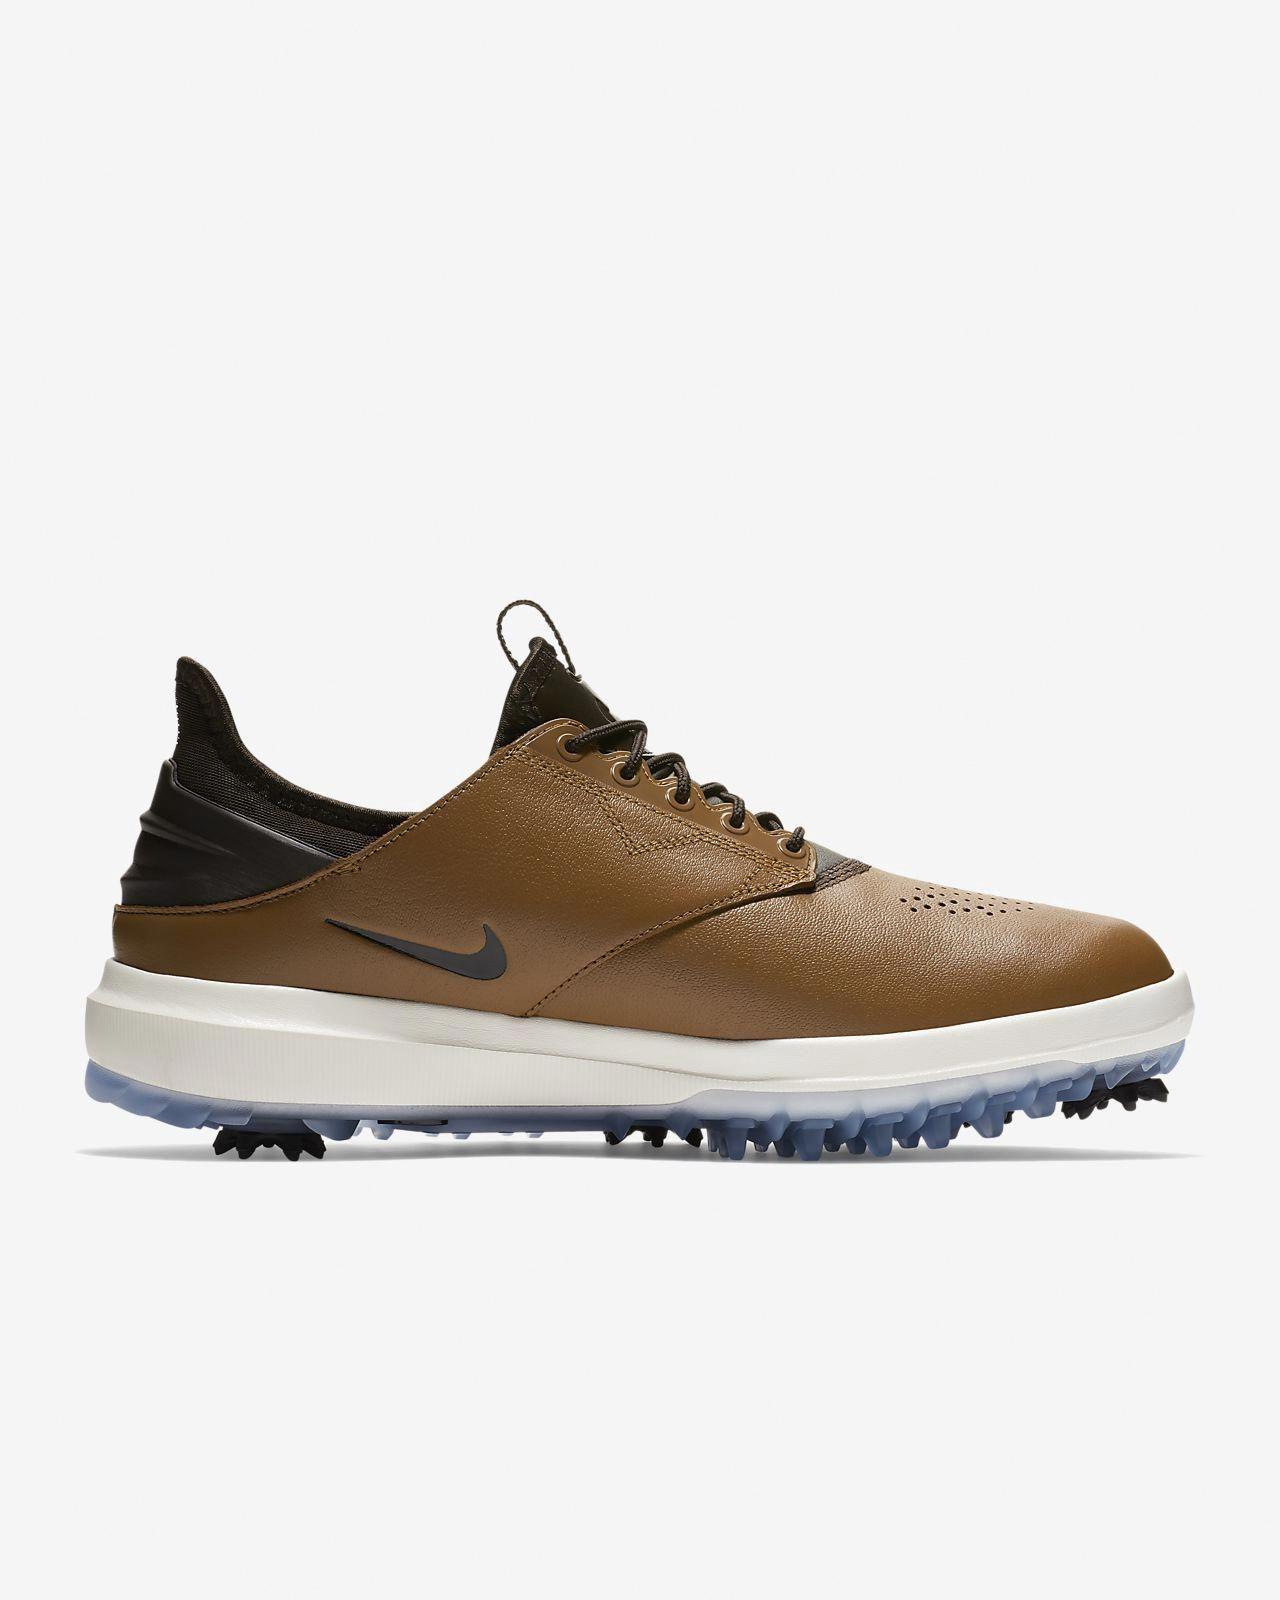 purchase cheap cbf9c 19d55 Nike Air Zoom Direct Mens Golf Shoe - 10.5 Platinum directgolf